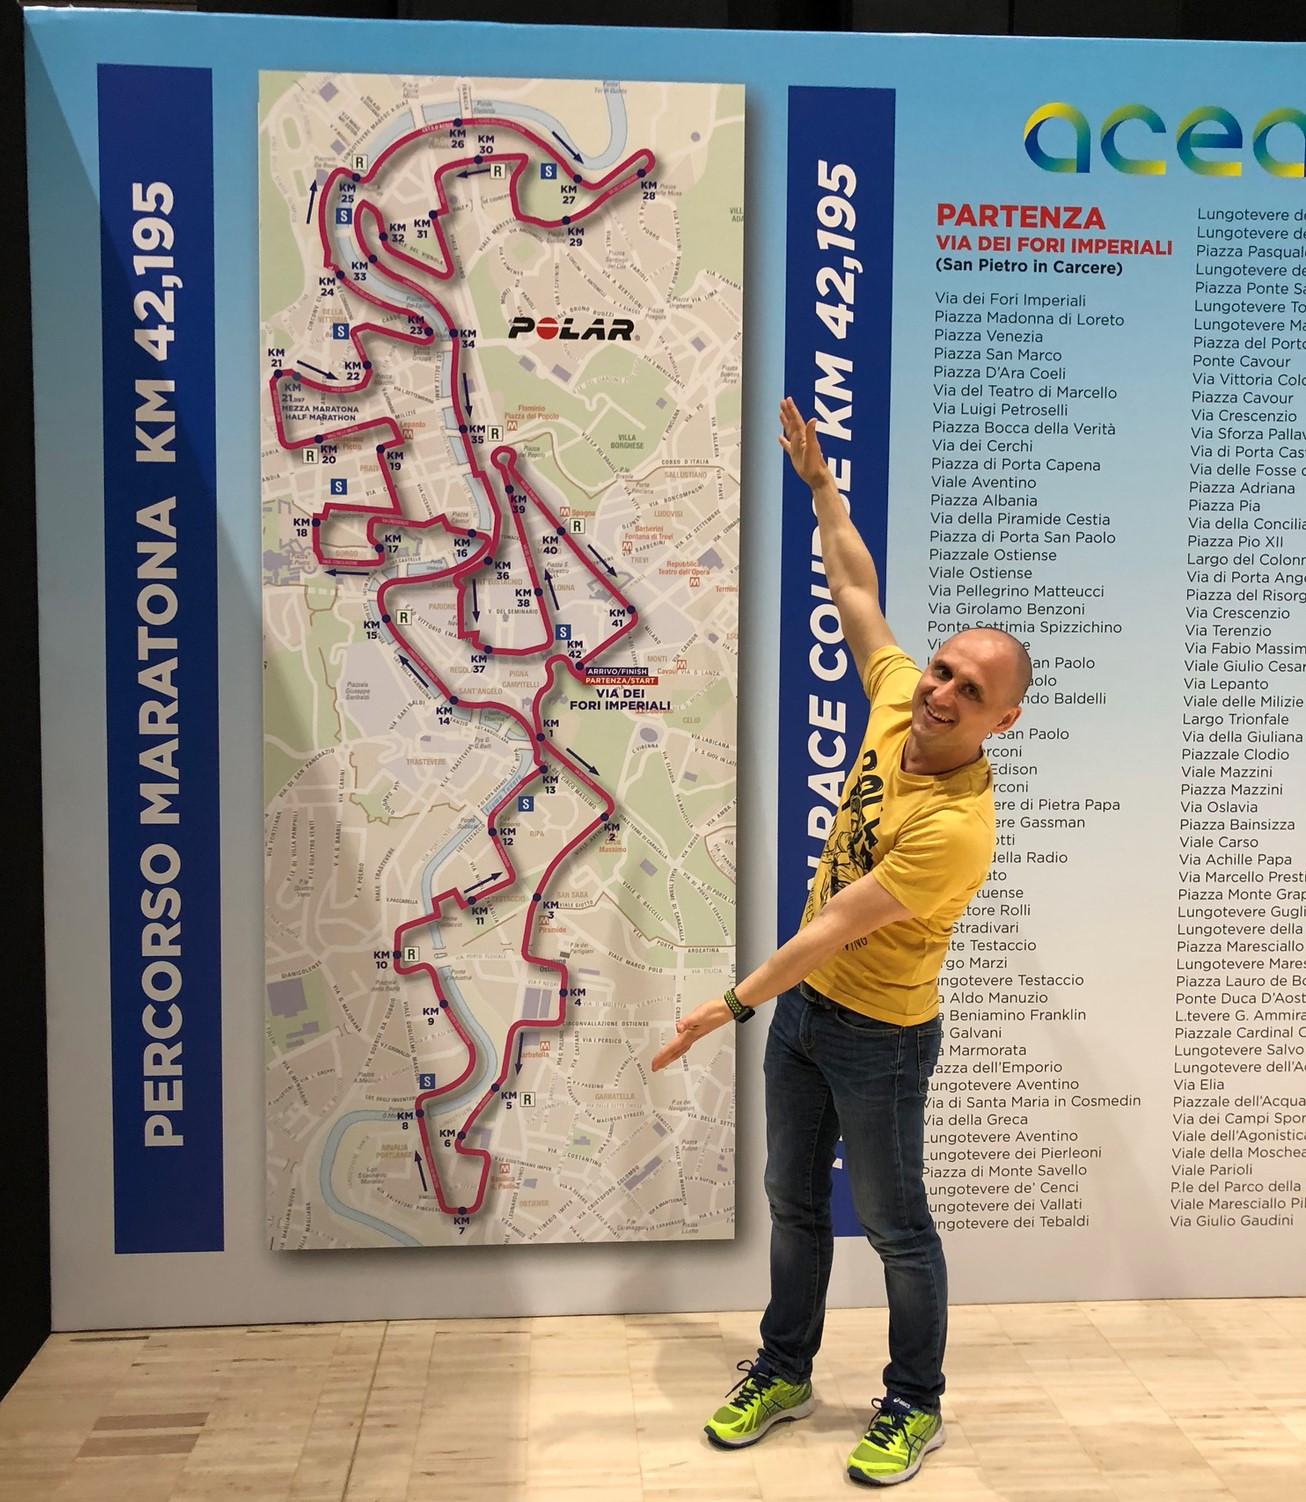 [Хабра-оффтоп] Maratona di Roma, или первый марафон для ИТ-шника - 3